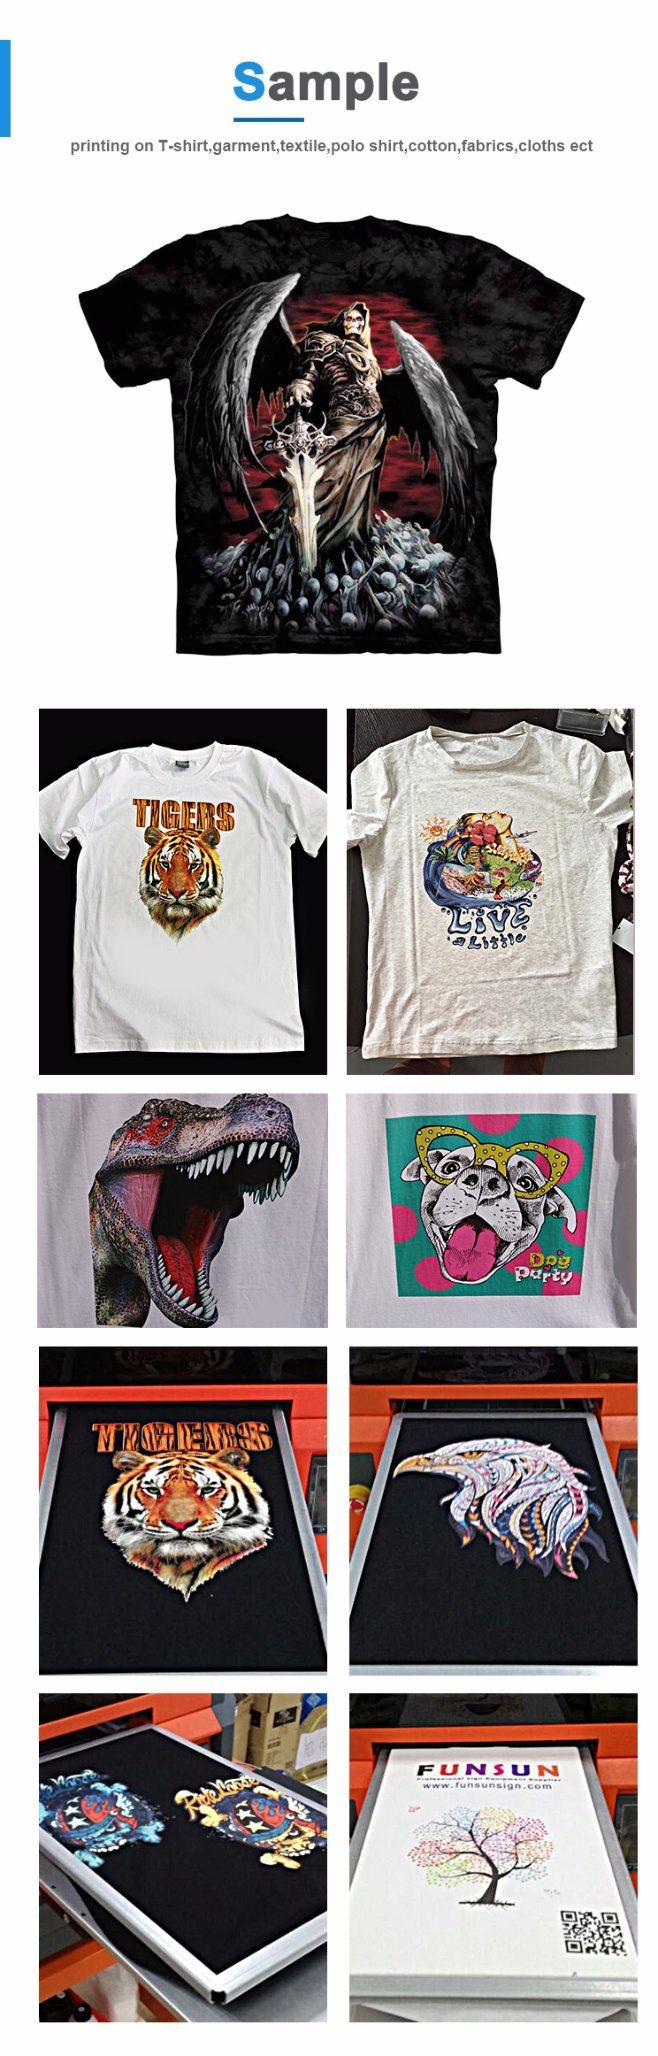 992107a6 Funsunjt T Shirt Printing Machine Philippines A3 Size - China T ...